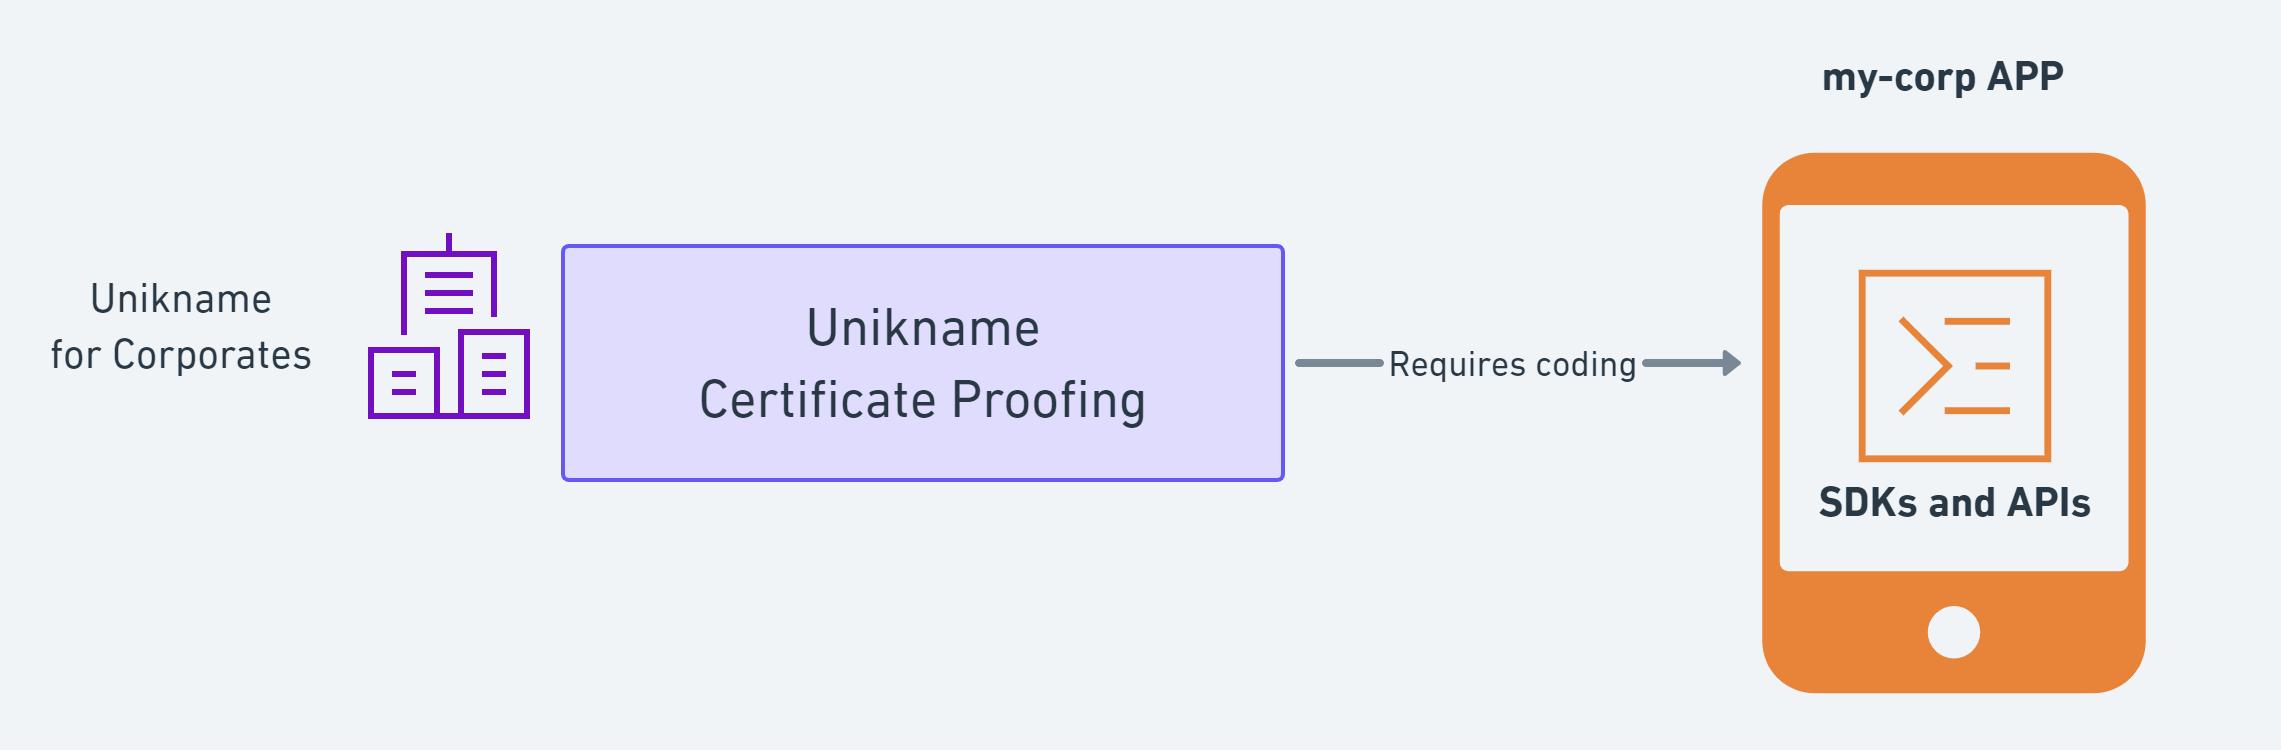 unikname_certificate_proofing